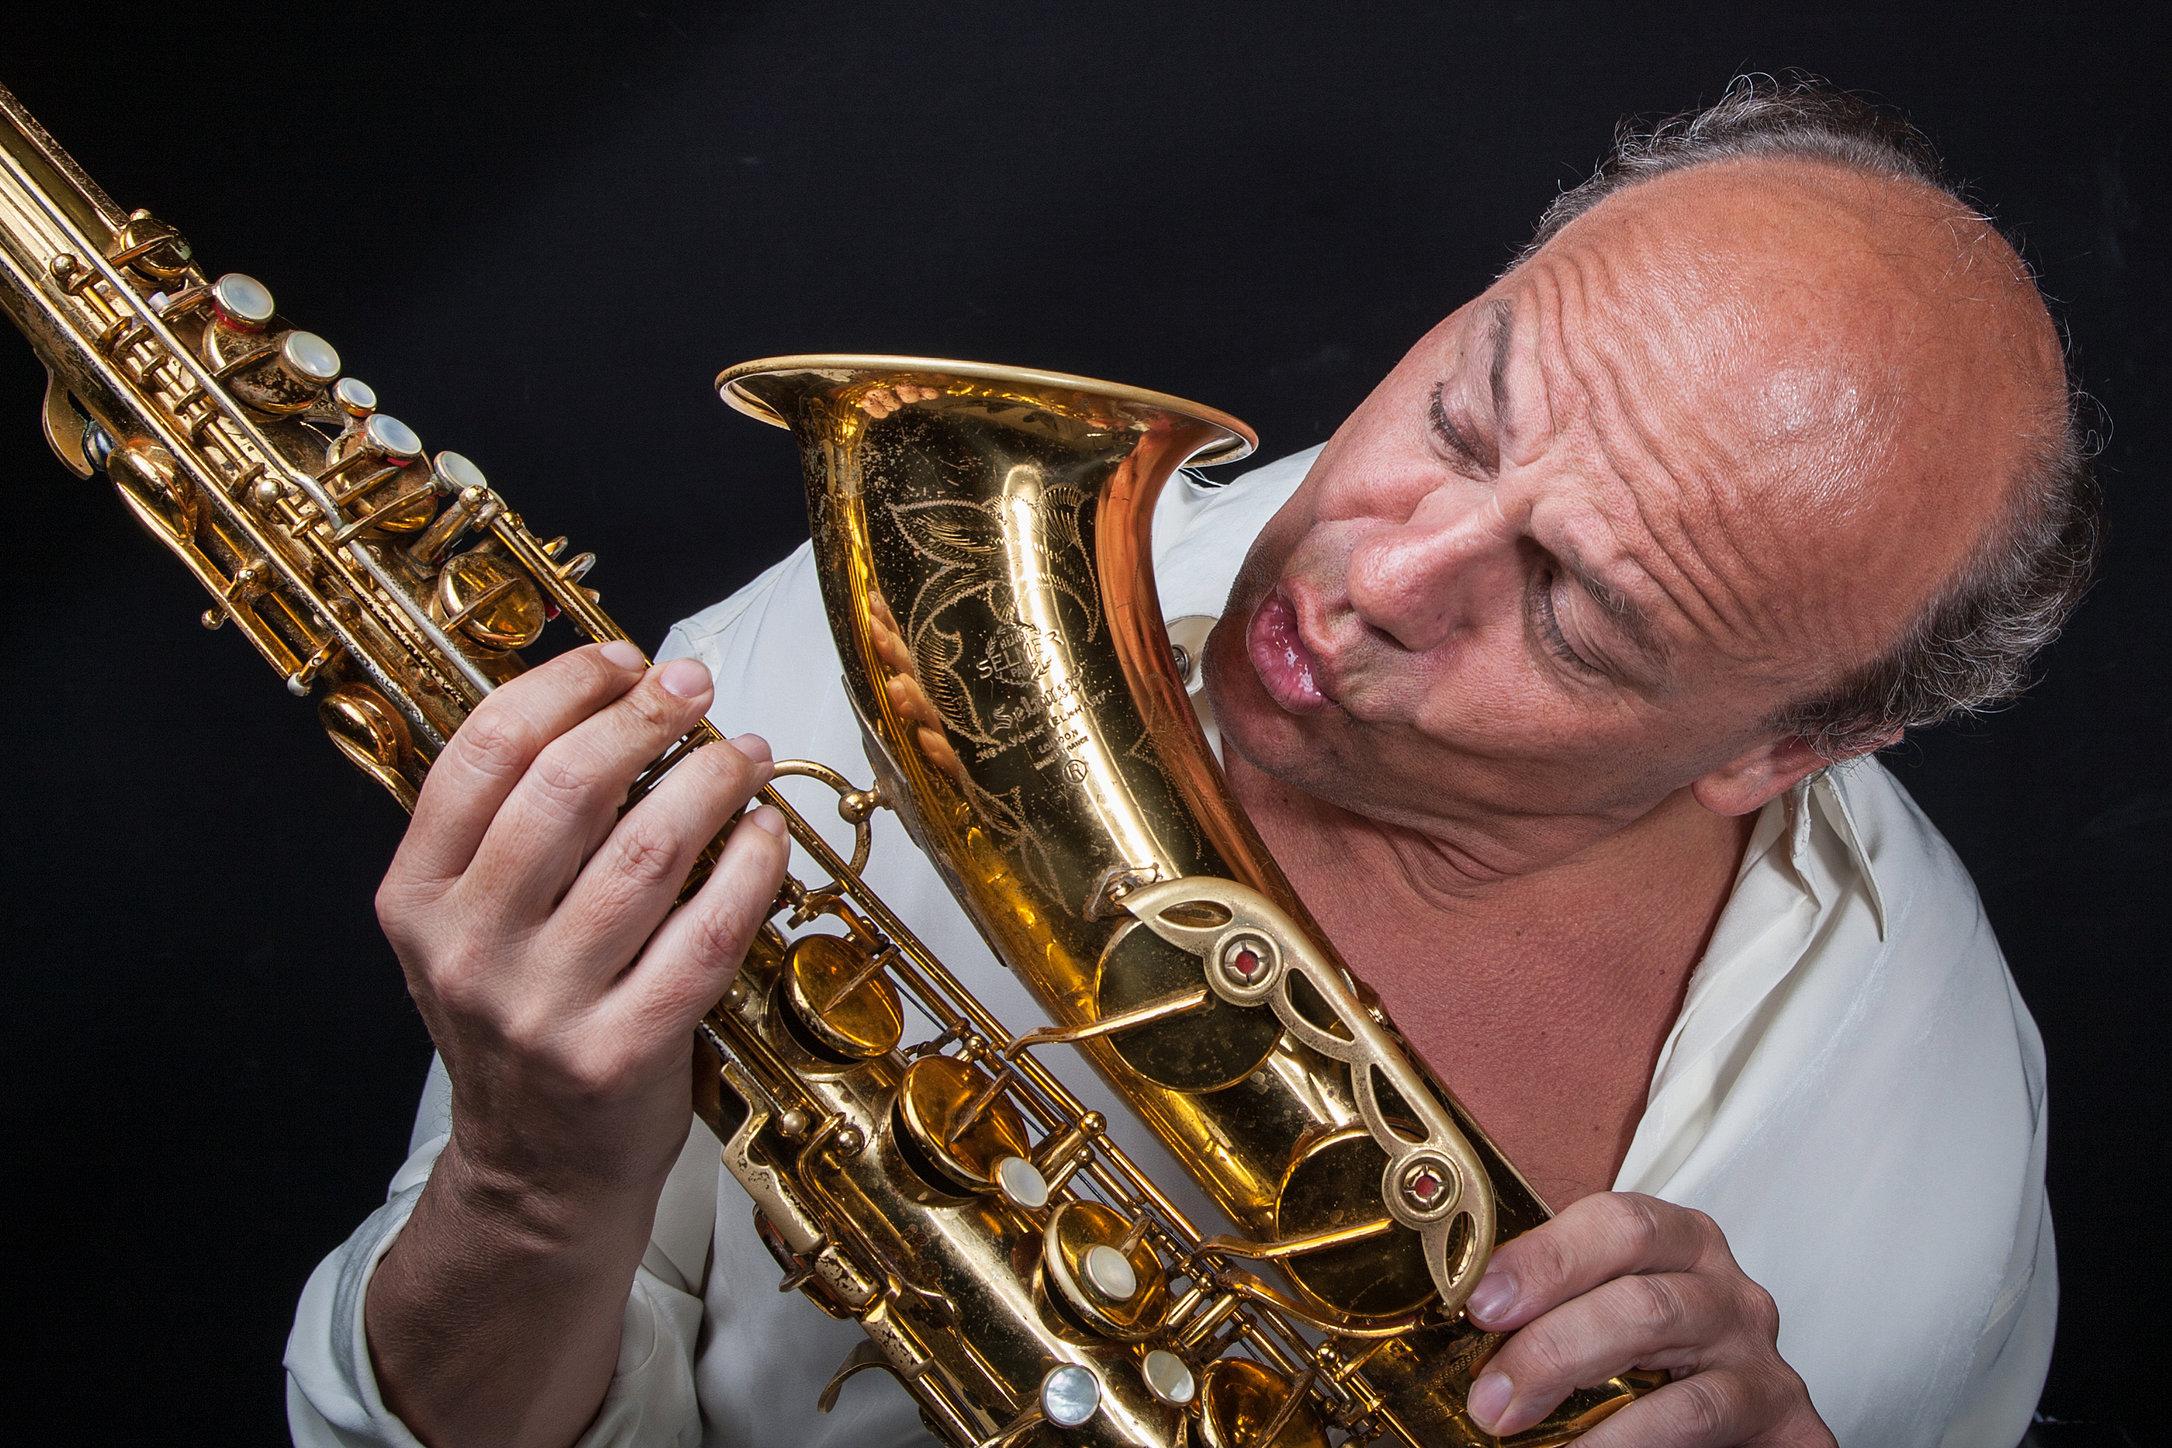 Toon Roos Jazz Musician